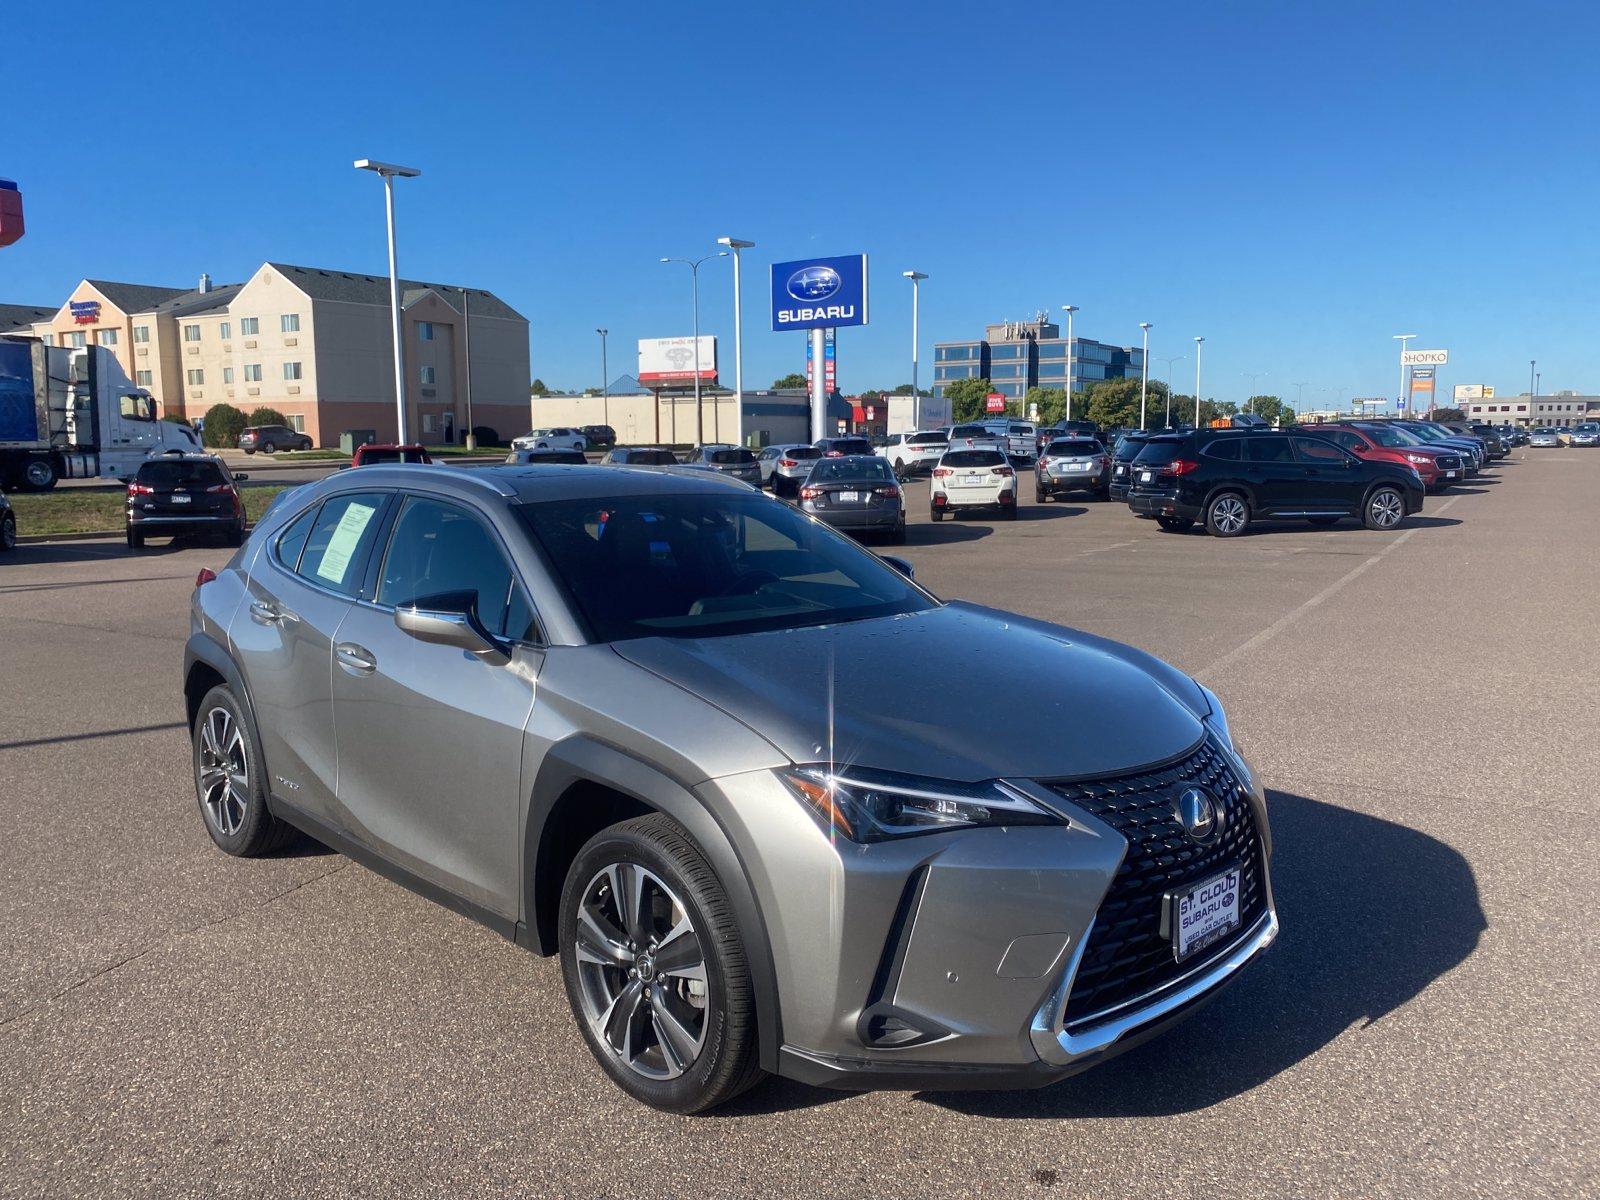 Used 2019 Lexus UX Hybrid 250h LUXURY with VIN JTHU9JBH6K2017679 for sale in Saint Cloud, Minnesota